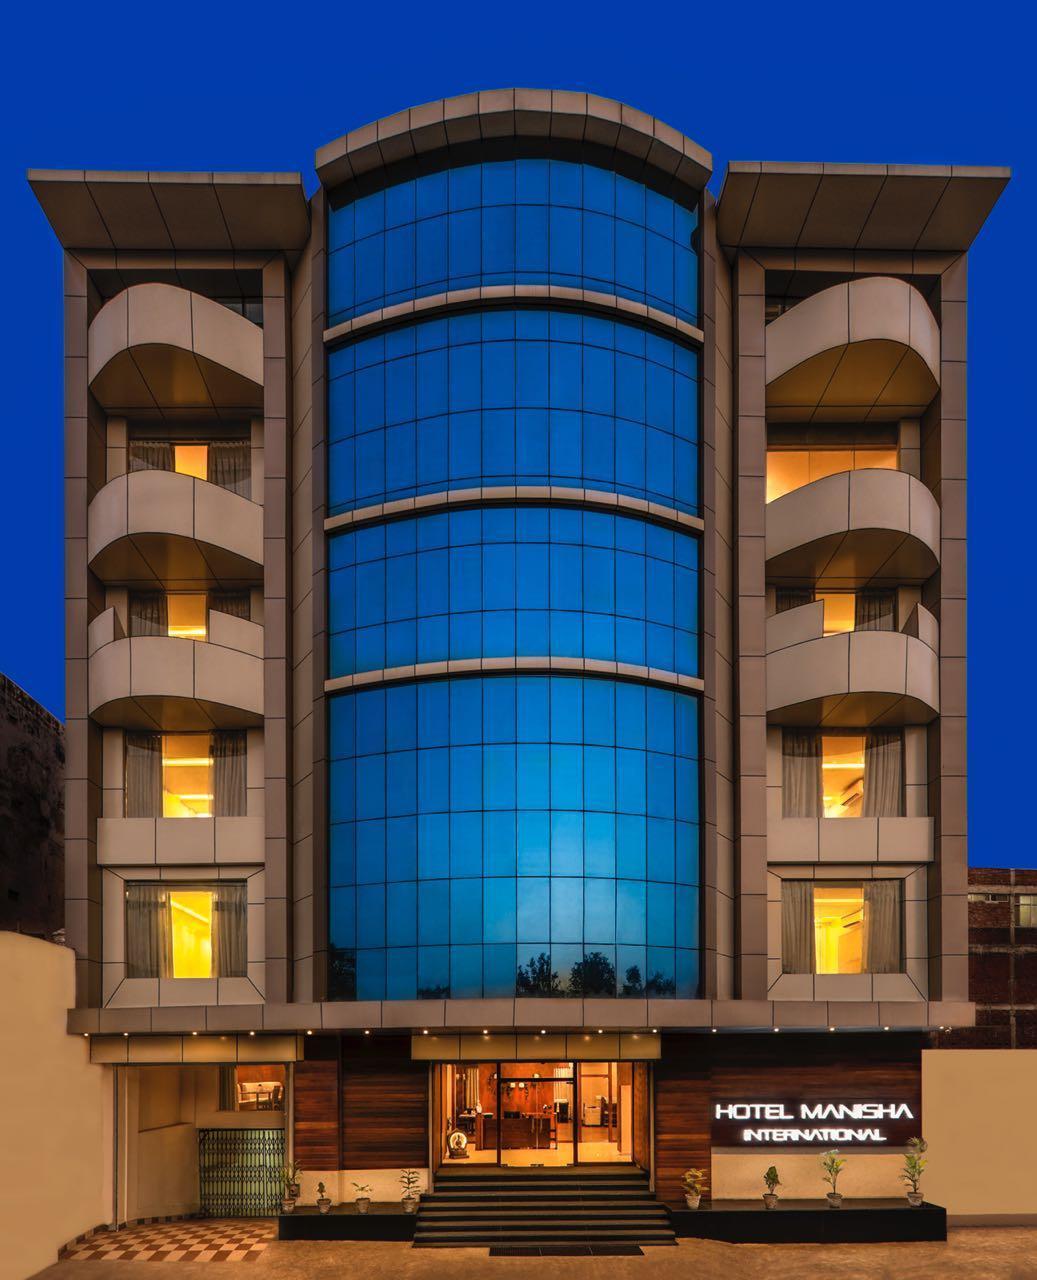 Hotel Manisha International